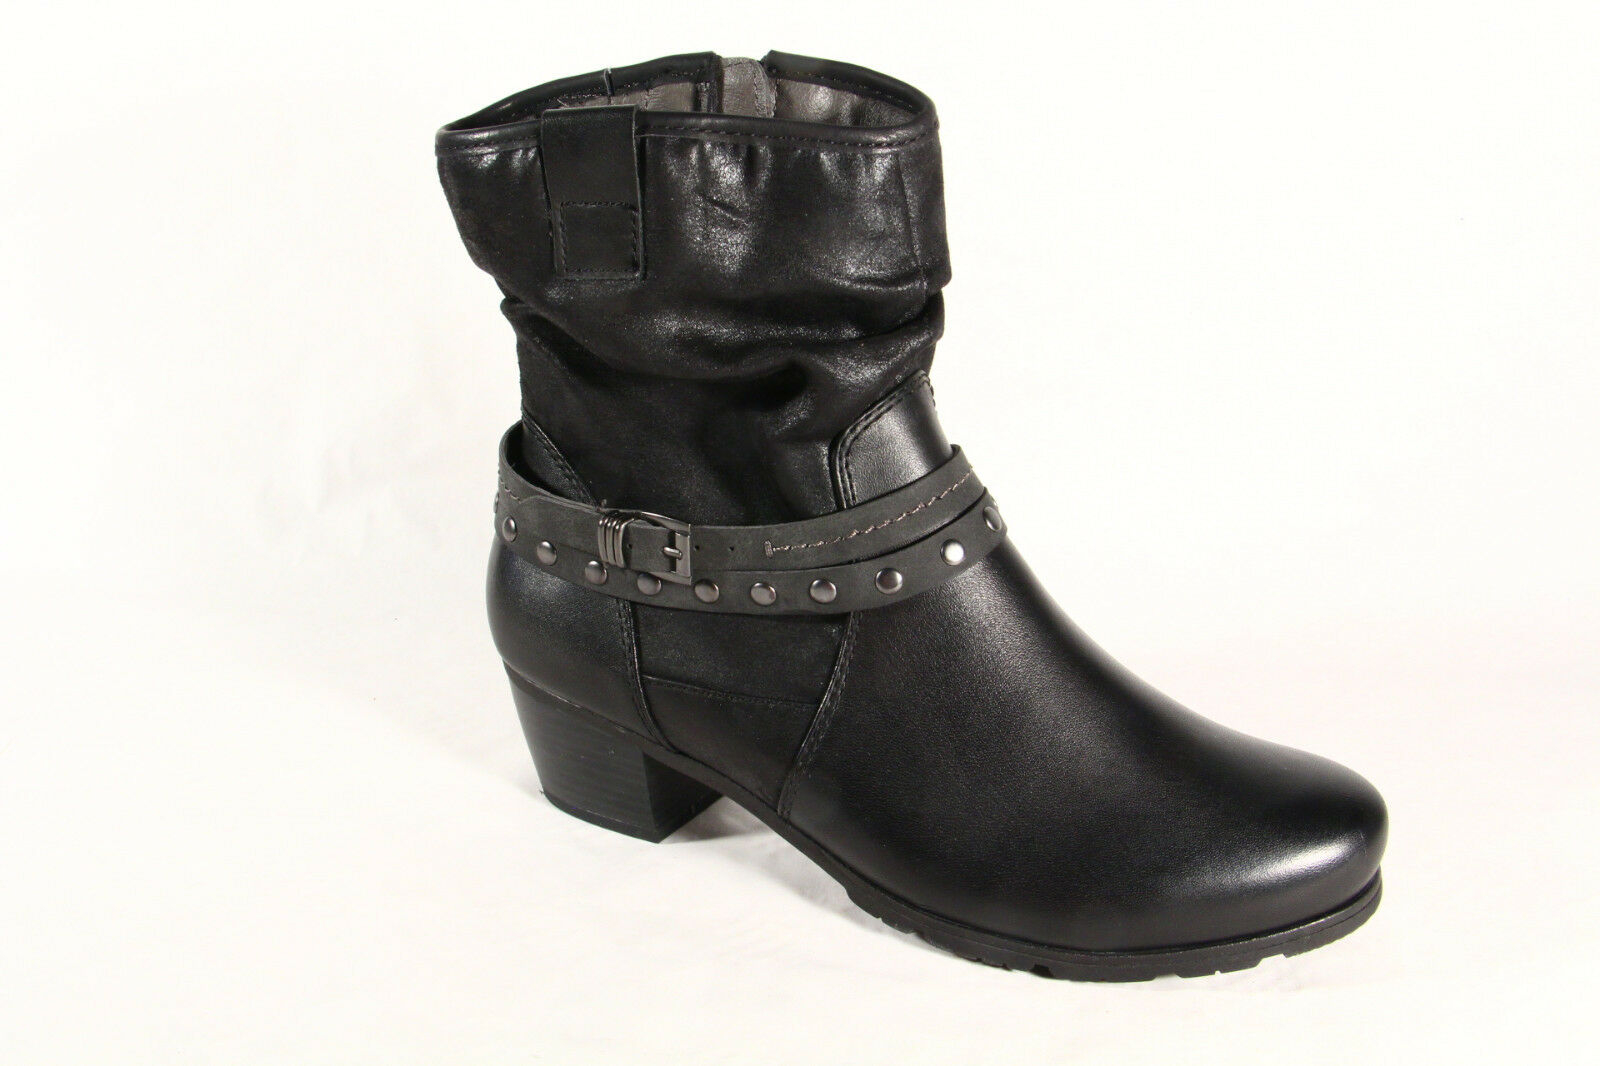 Jana Damen Stiefel, schwarz Stiefeletten, Stiefel Winterstiefel Leder schwarz Stiefel, 25335  NEU bd265f